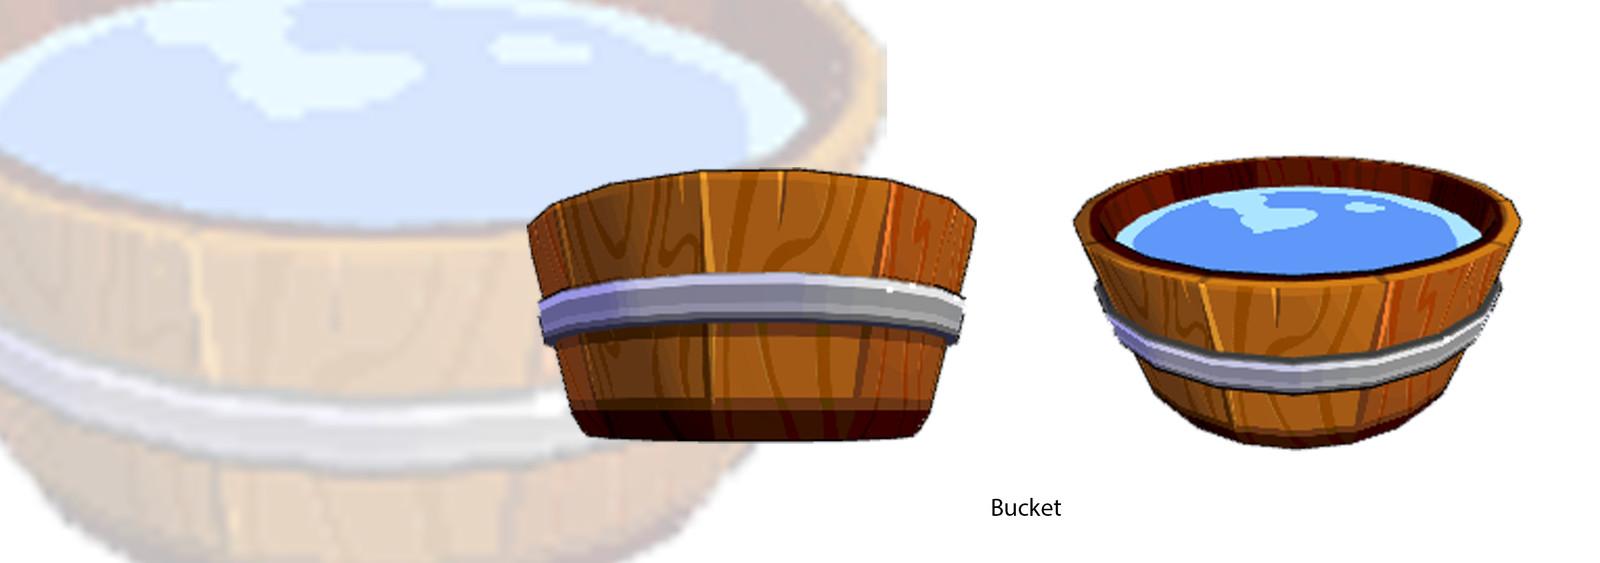 Bucket Model and texture